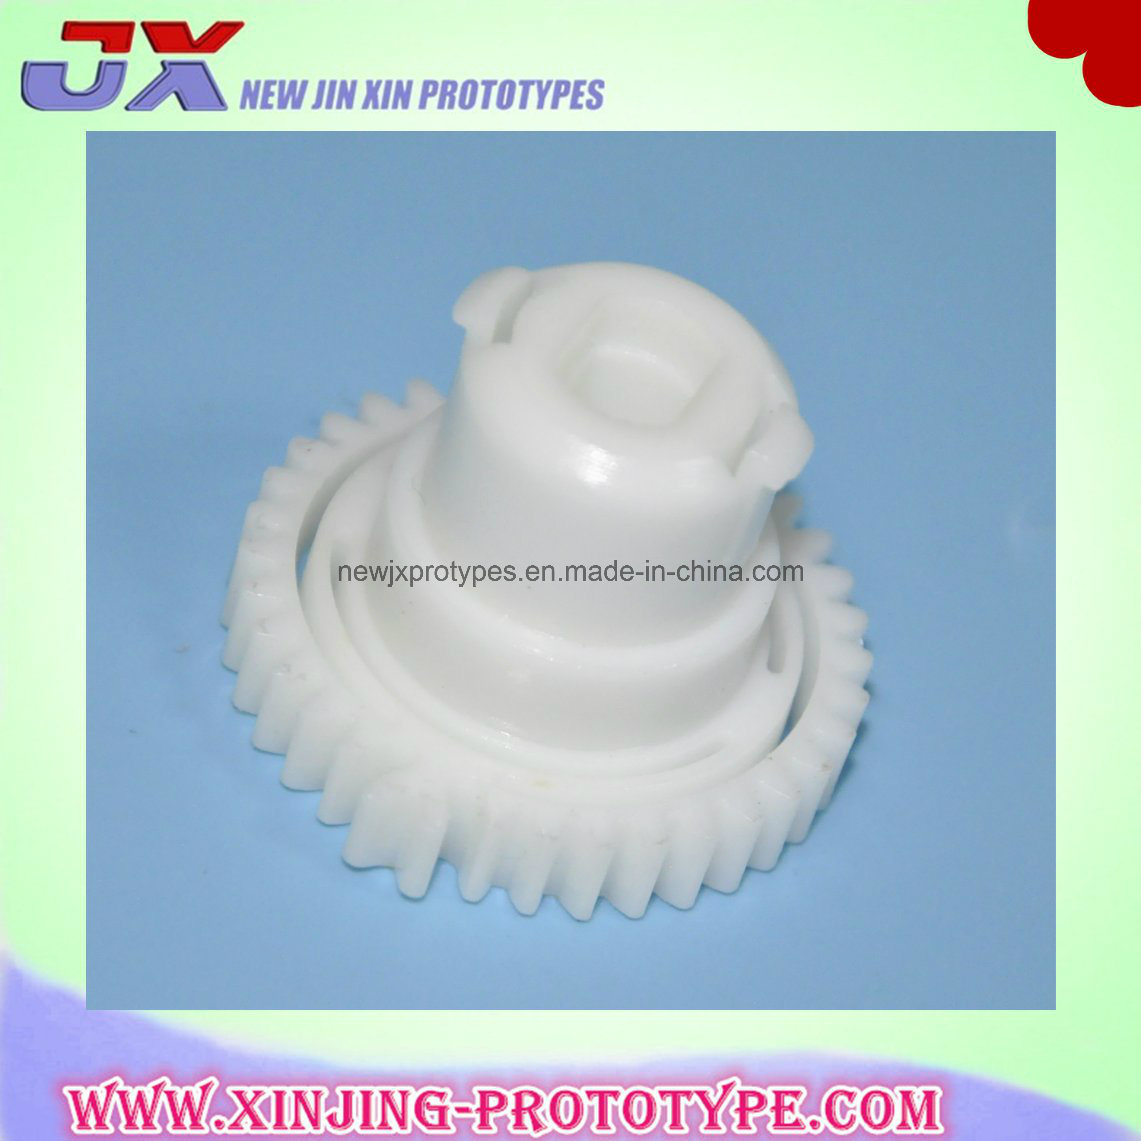 Manufacturer for Prototypes SLA&SLS 3D Print Parts